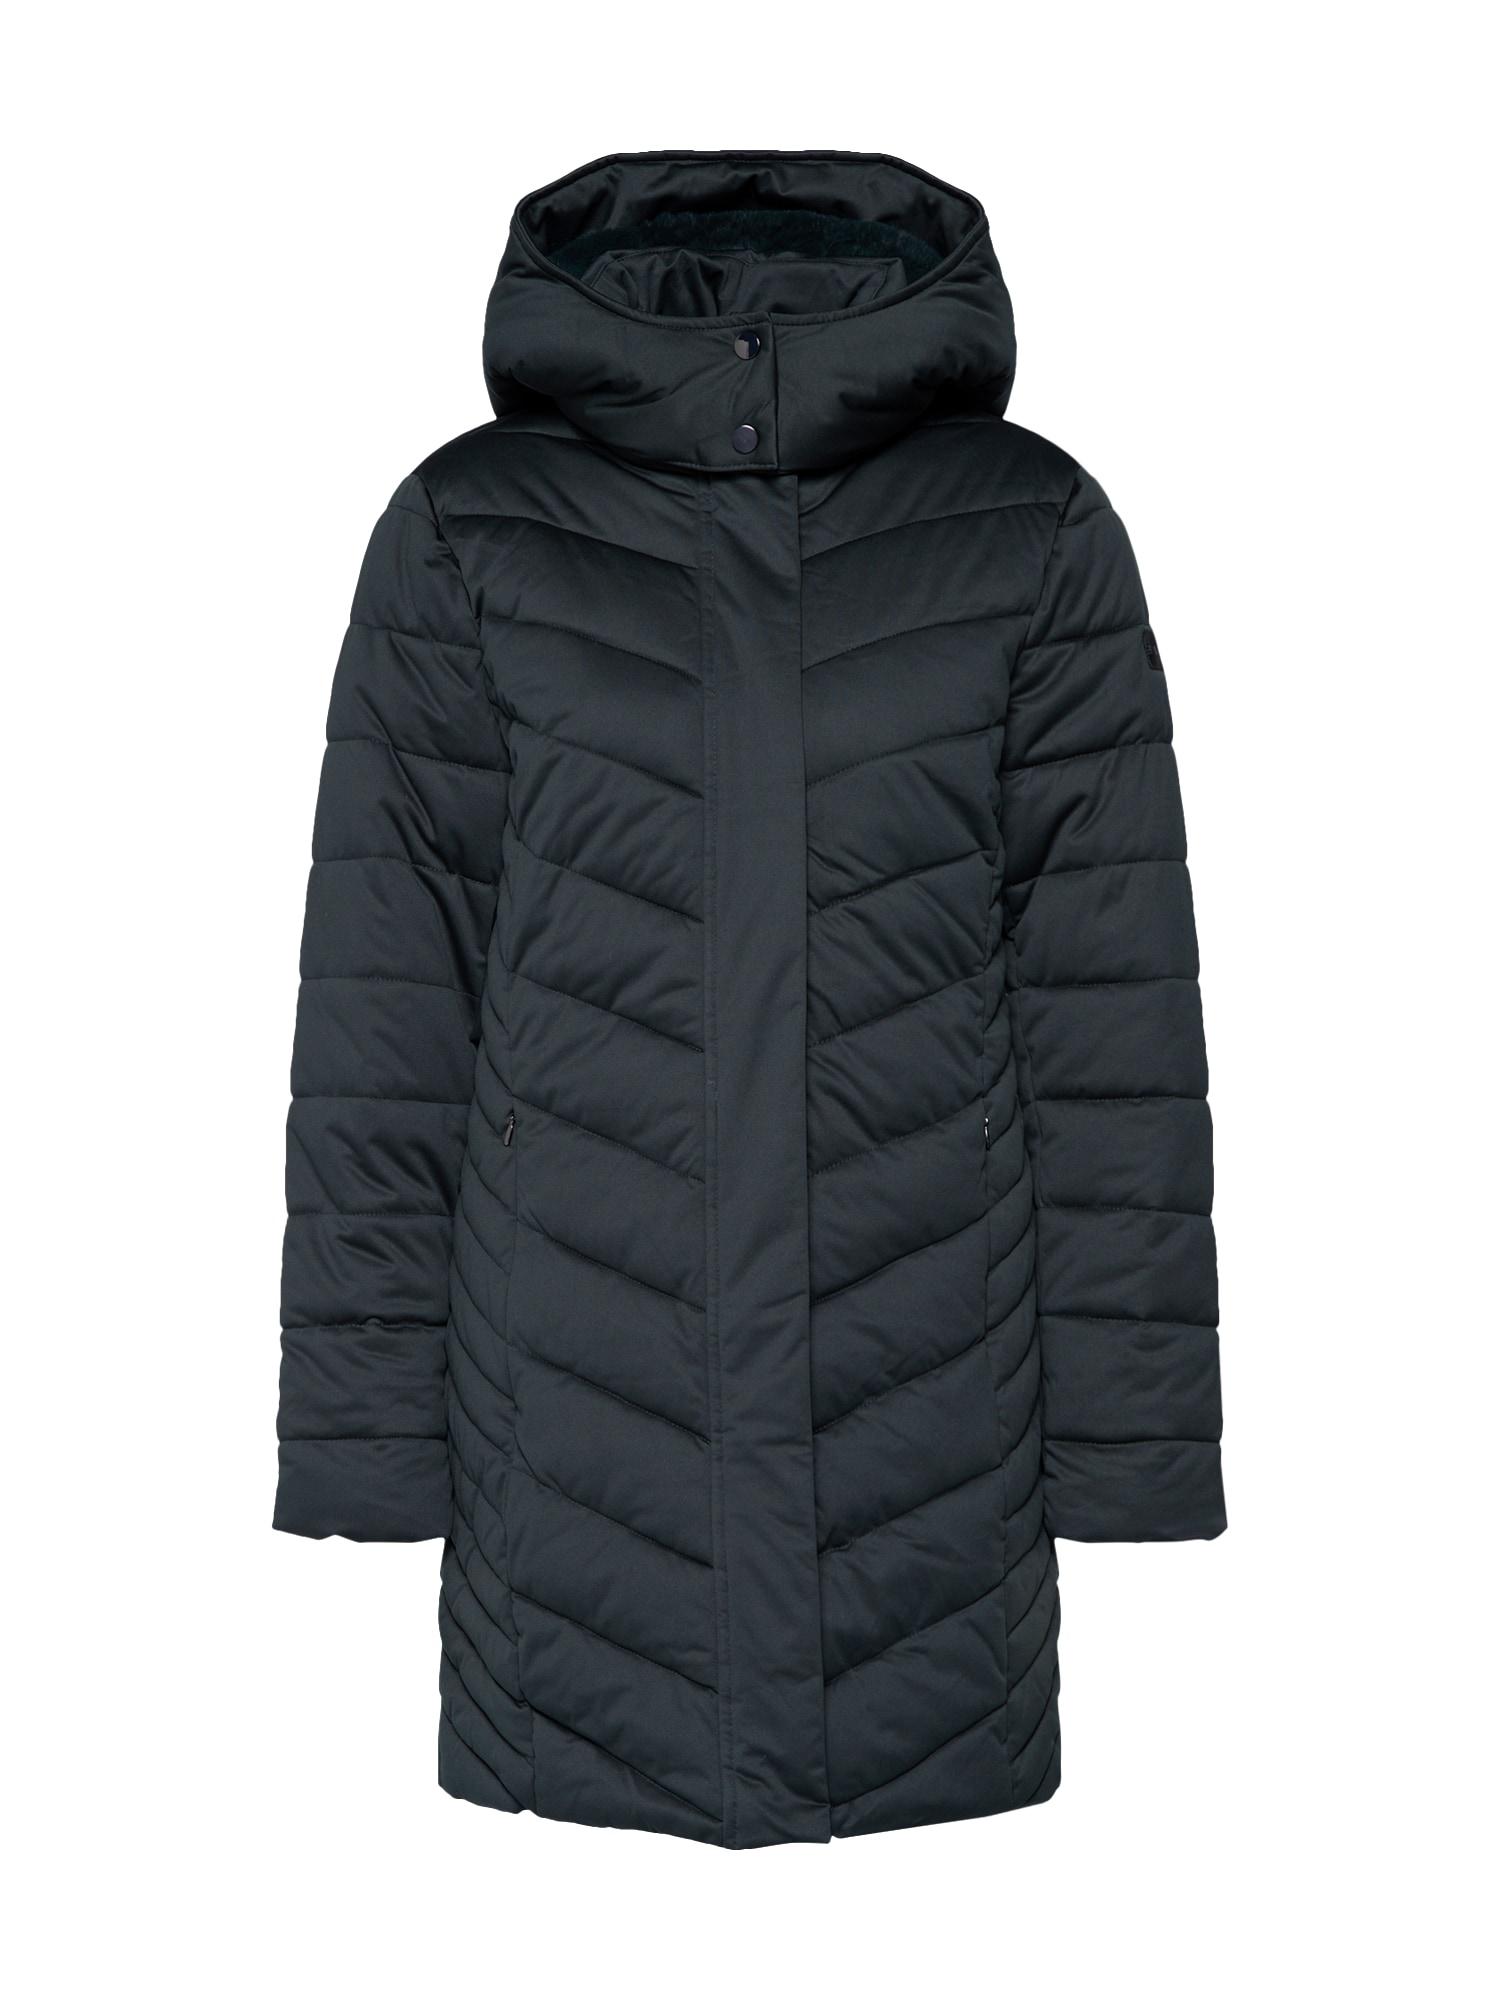 ESPRIT Žieminis paltas 'Polyfiller' įdegio spalva